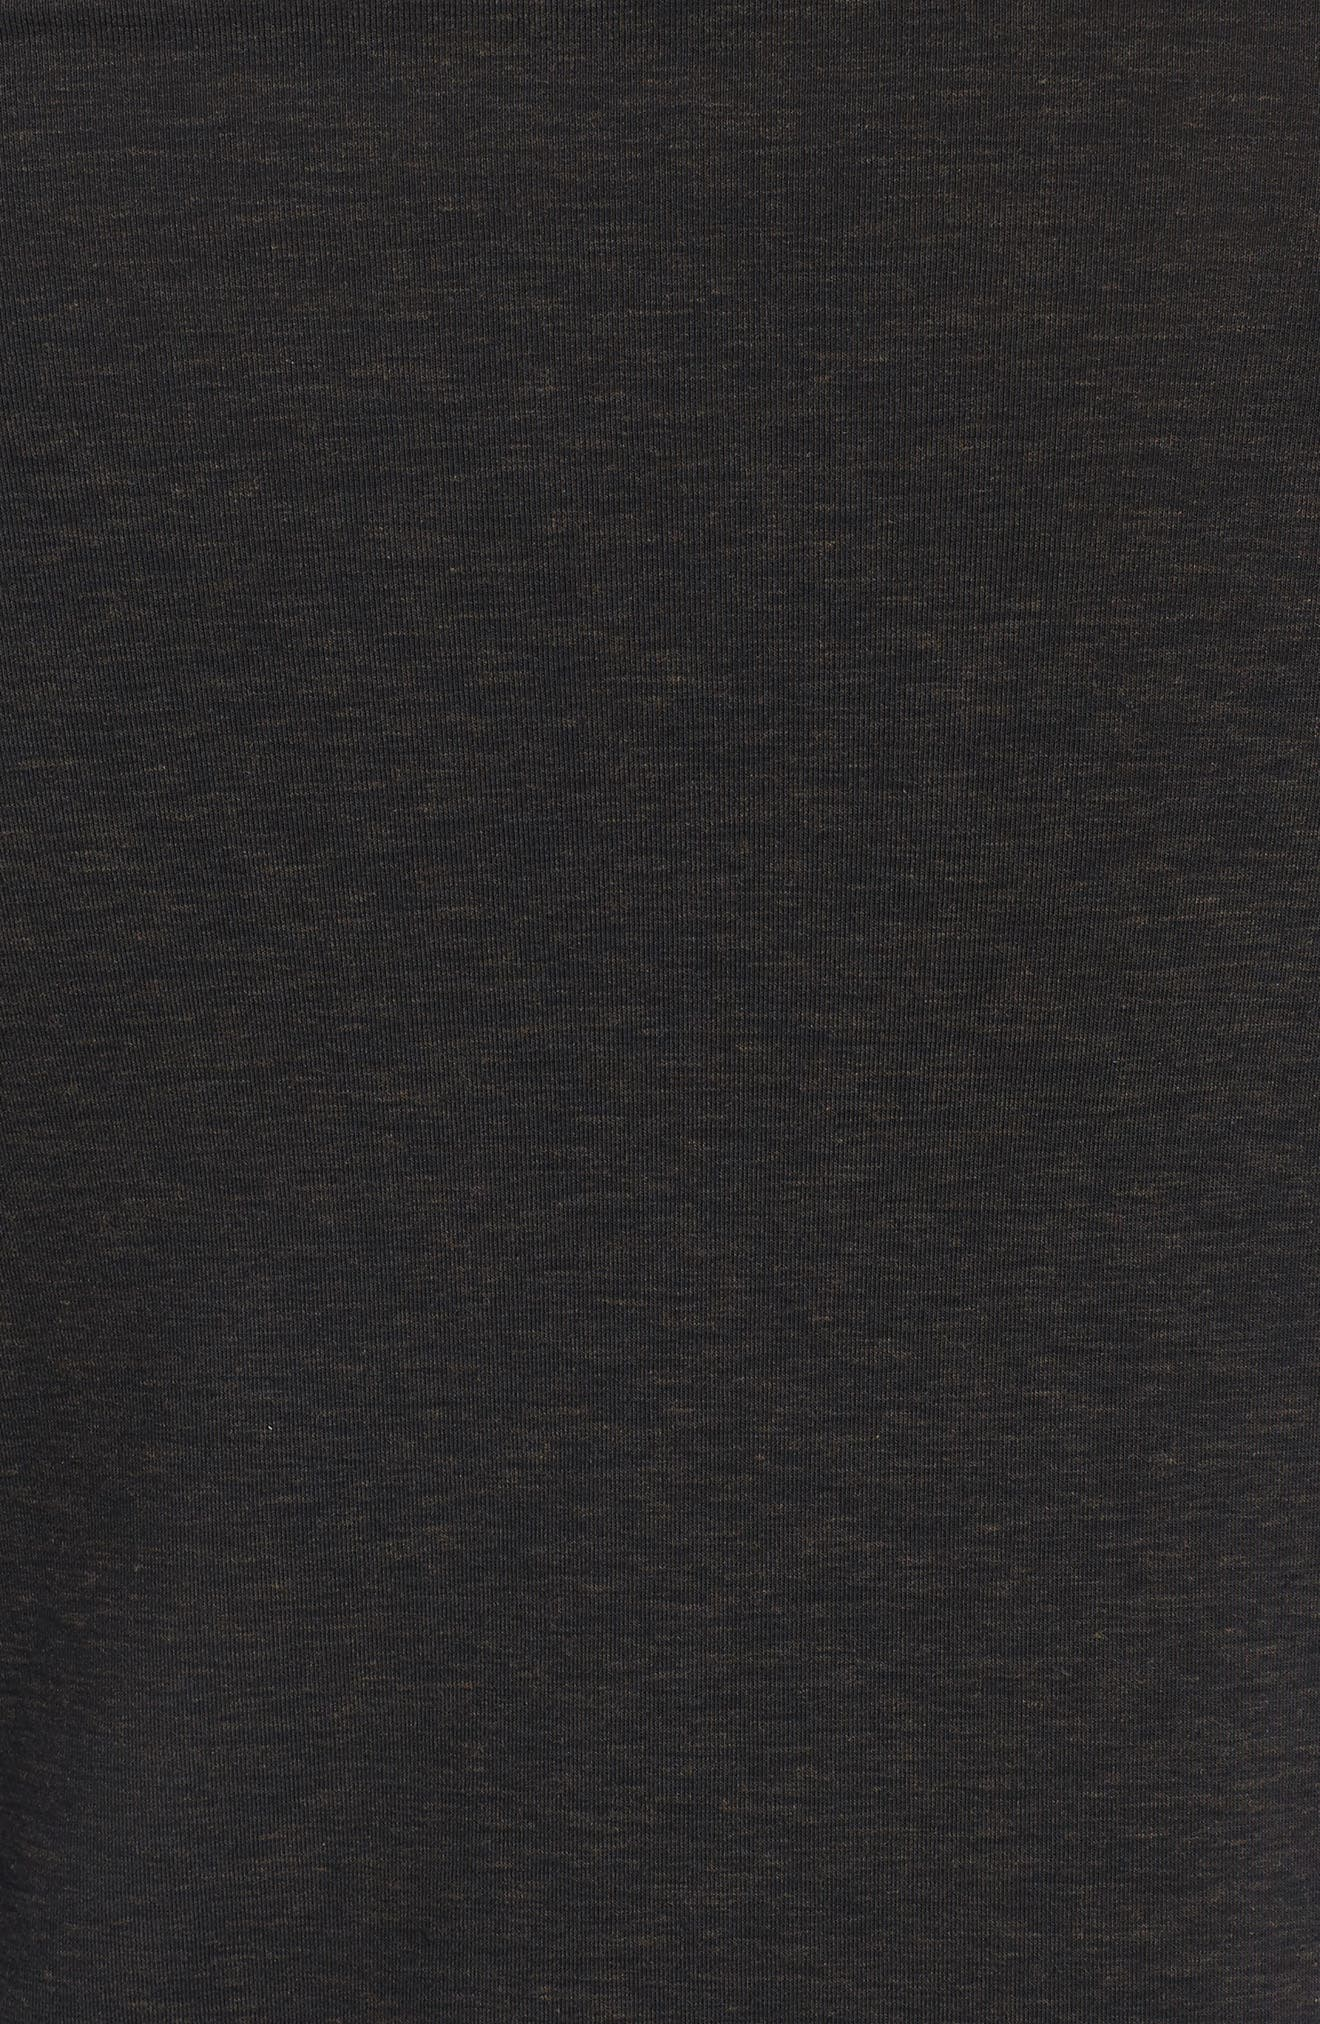 Long Sleeve T-Shirt,                             Alternate thumbnail 5, color,                             BLACK OXIDE HEATHER